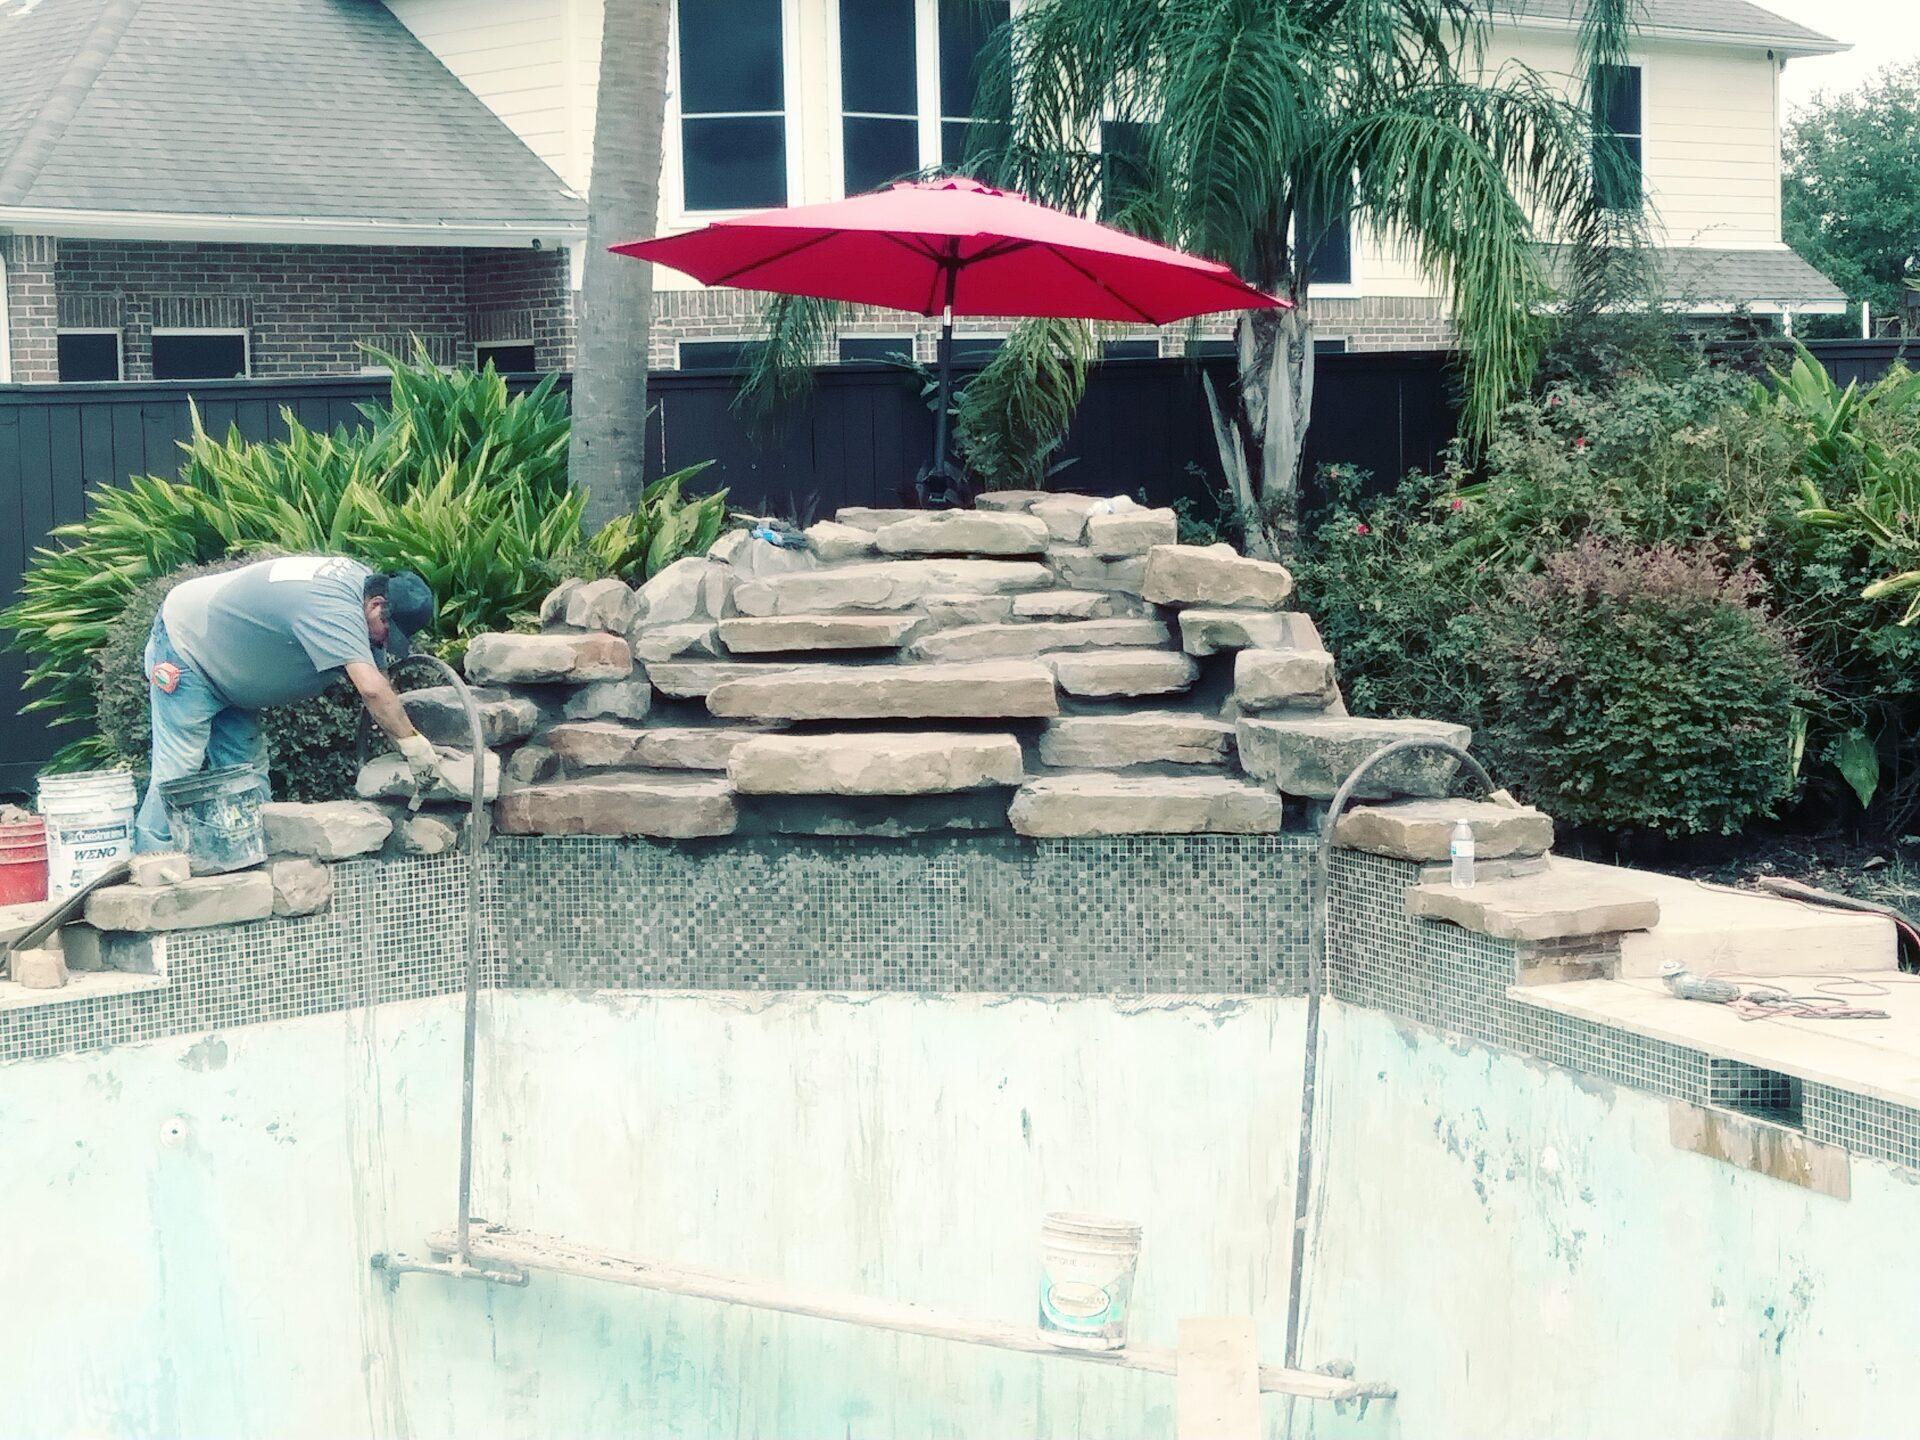 Pool Remodel - Katy - After Image004